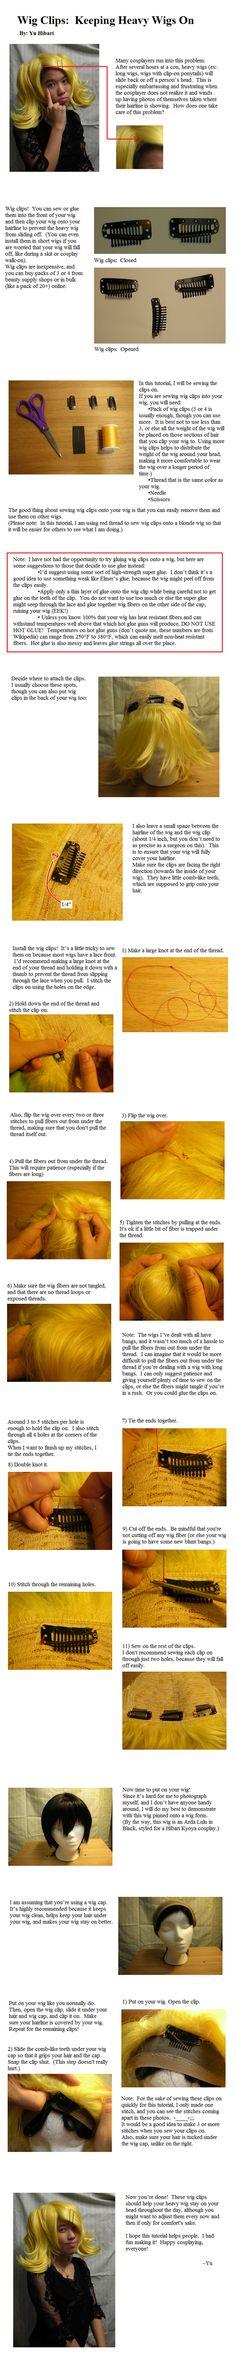 Wig Clips: Keeping Heavy Wigs On   Arda Wigs